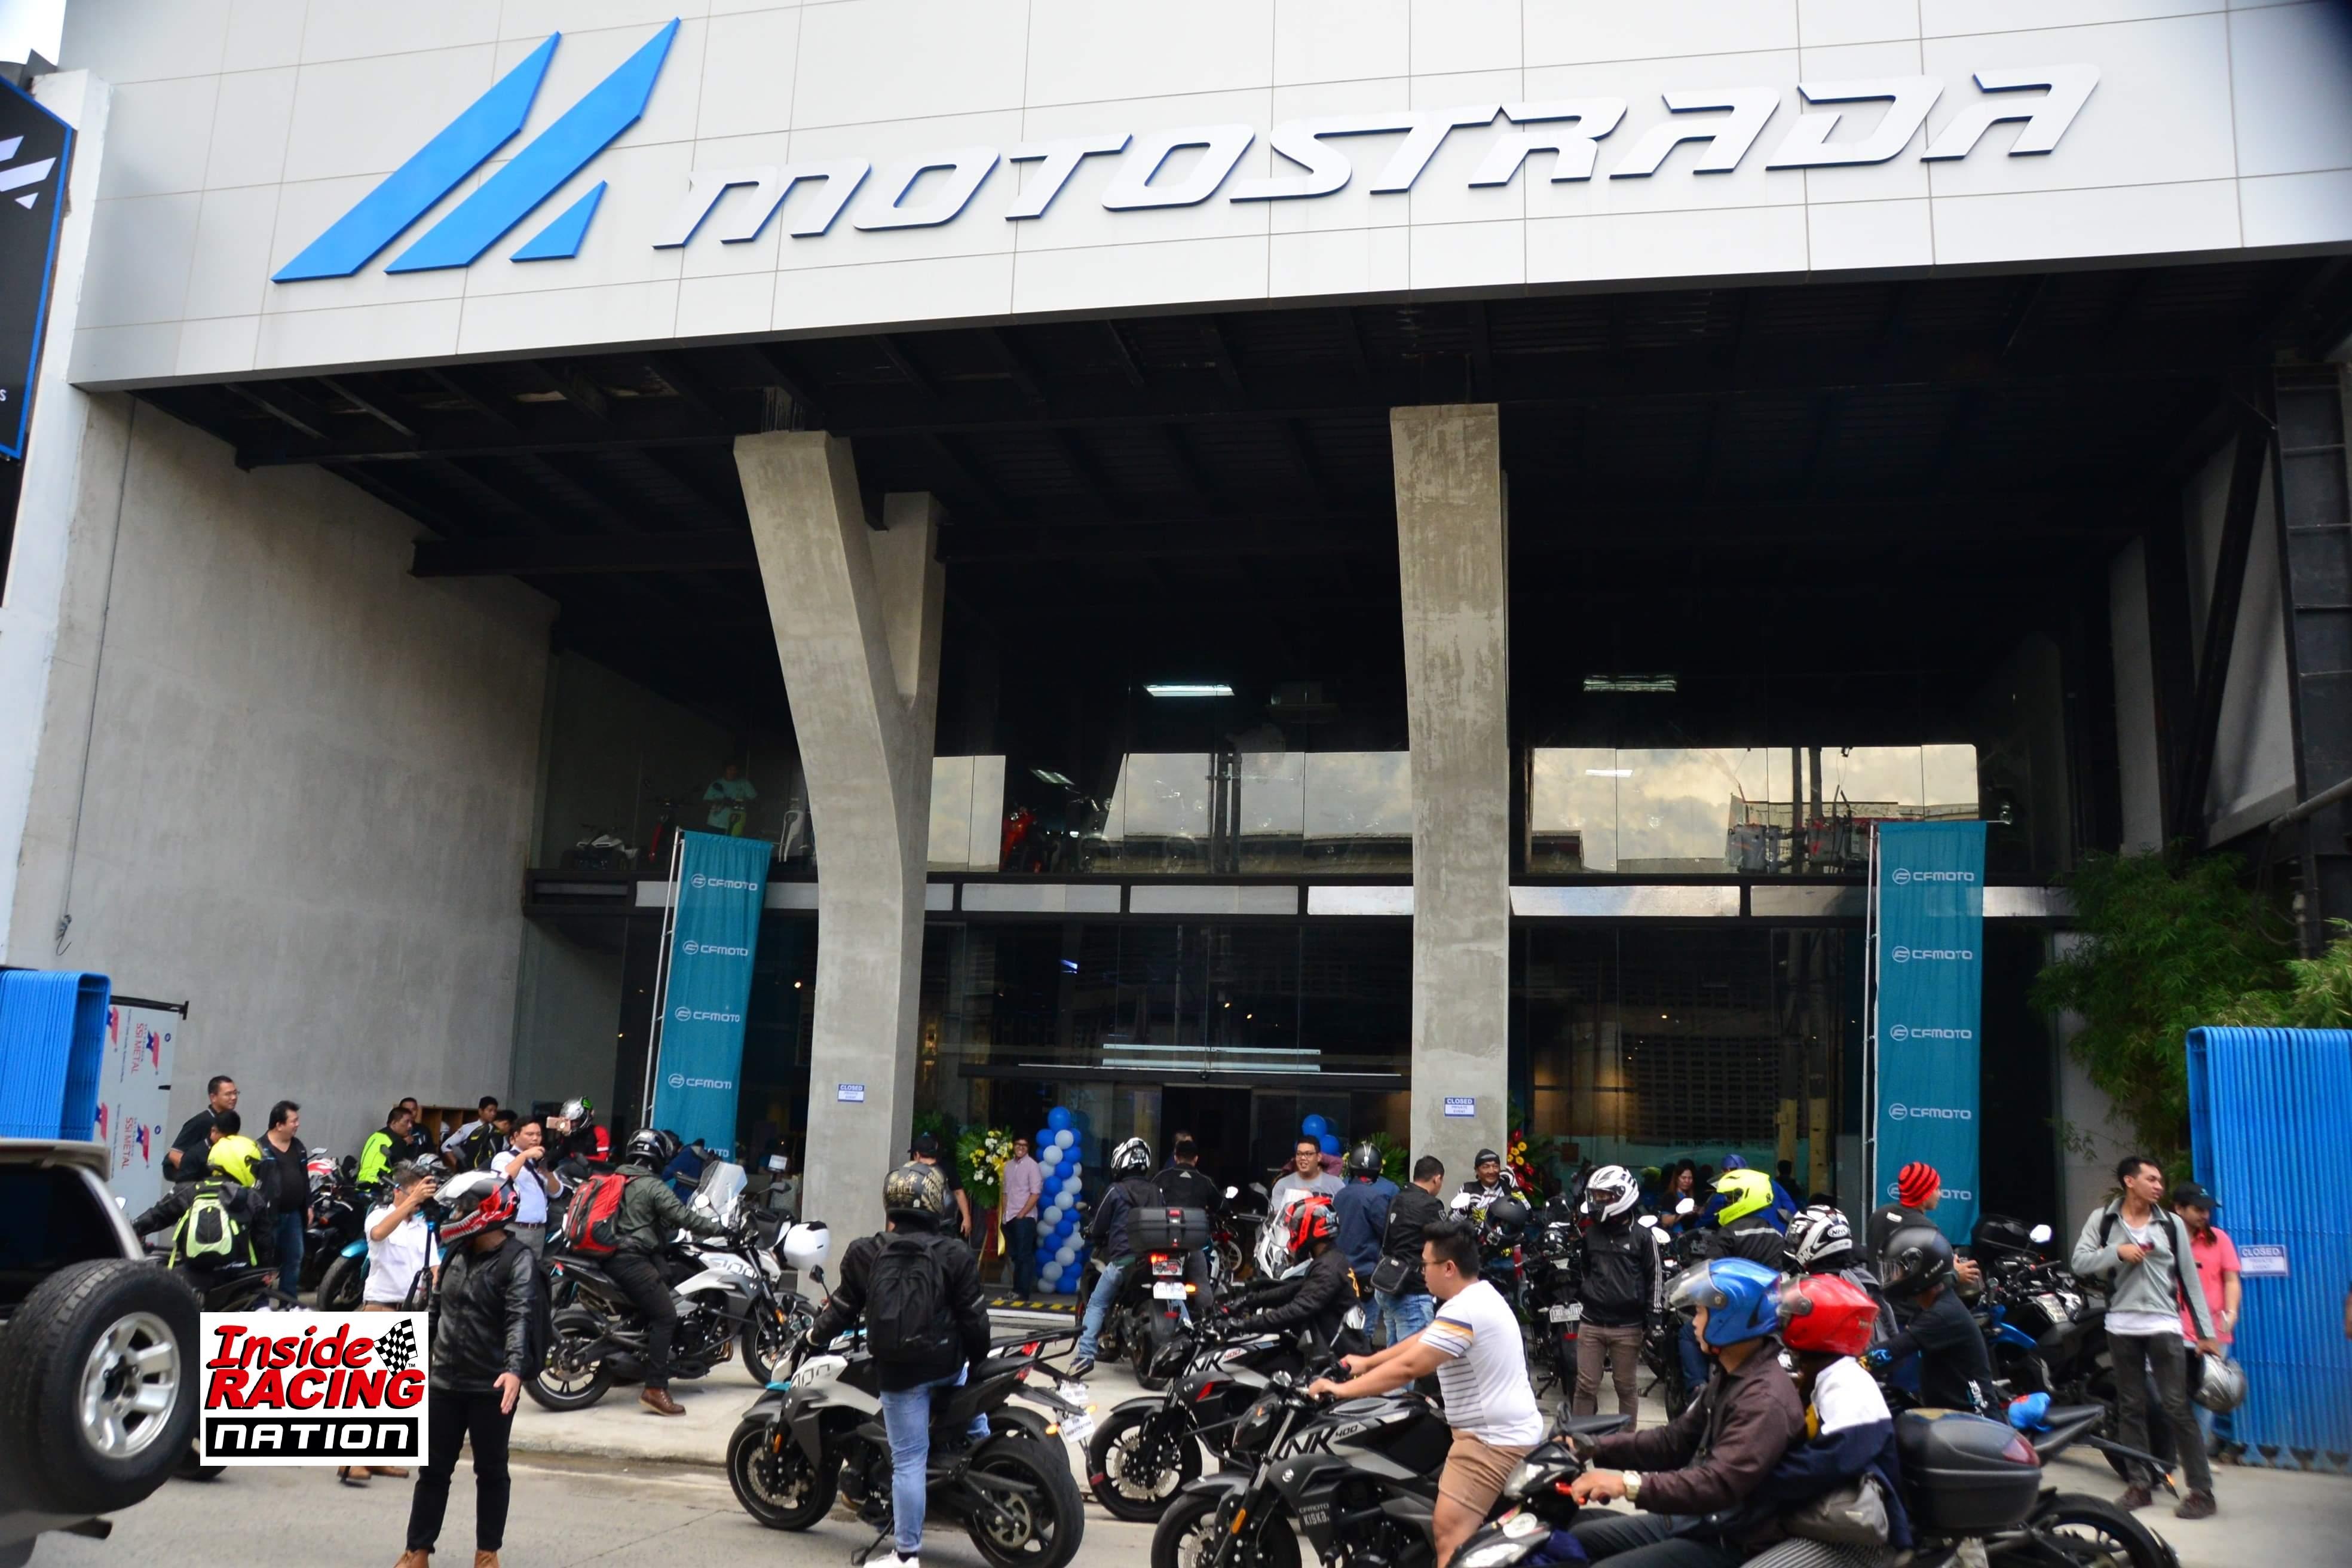 Motostrada opening last year.